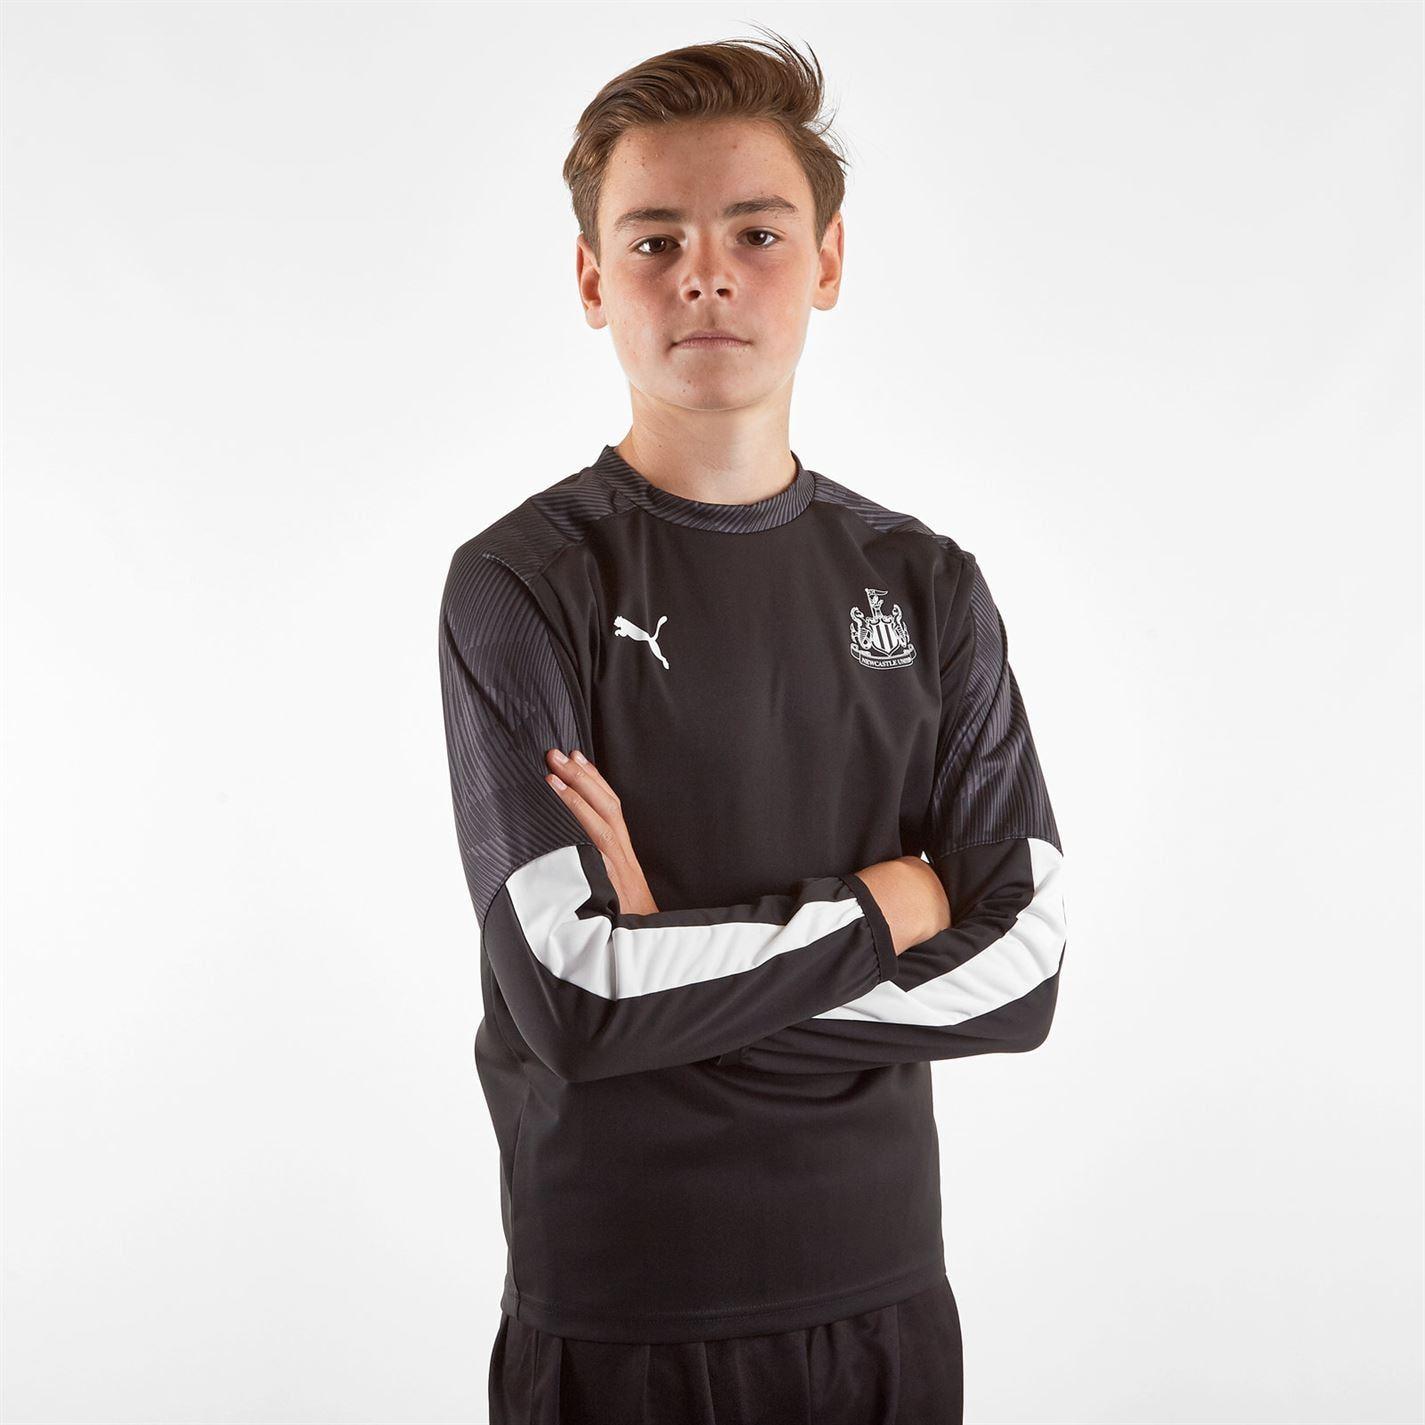 Puma-Newcastle-United-T-Shirt-Junior-Football-Boys-Soccer-Fan-Jersey-Drill-Top thumbnail 4